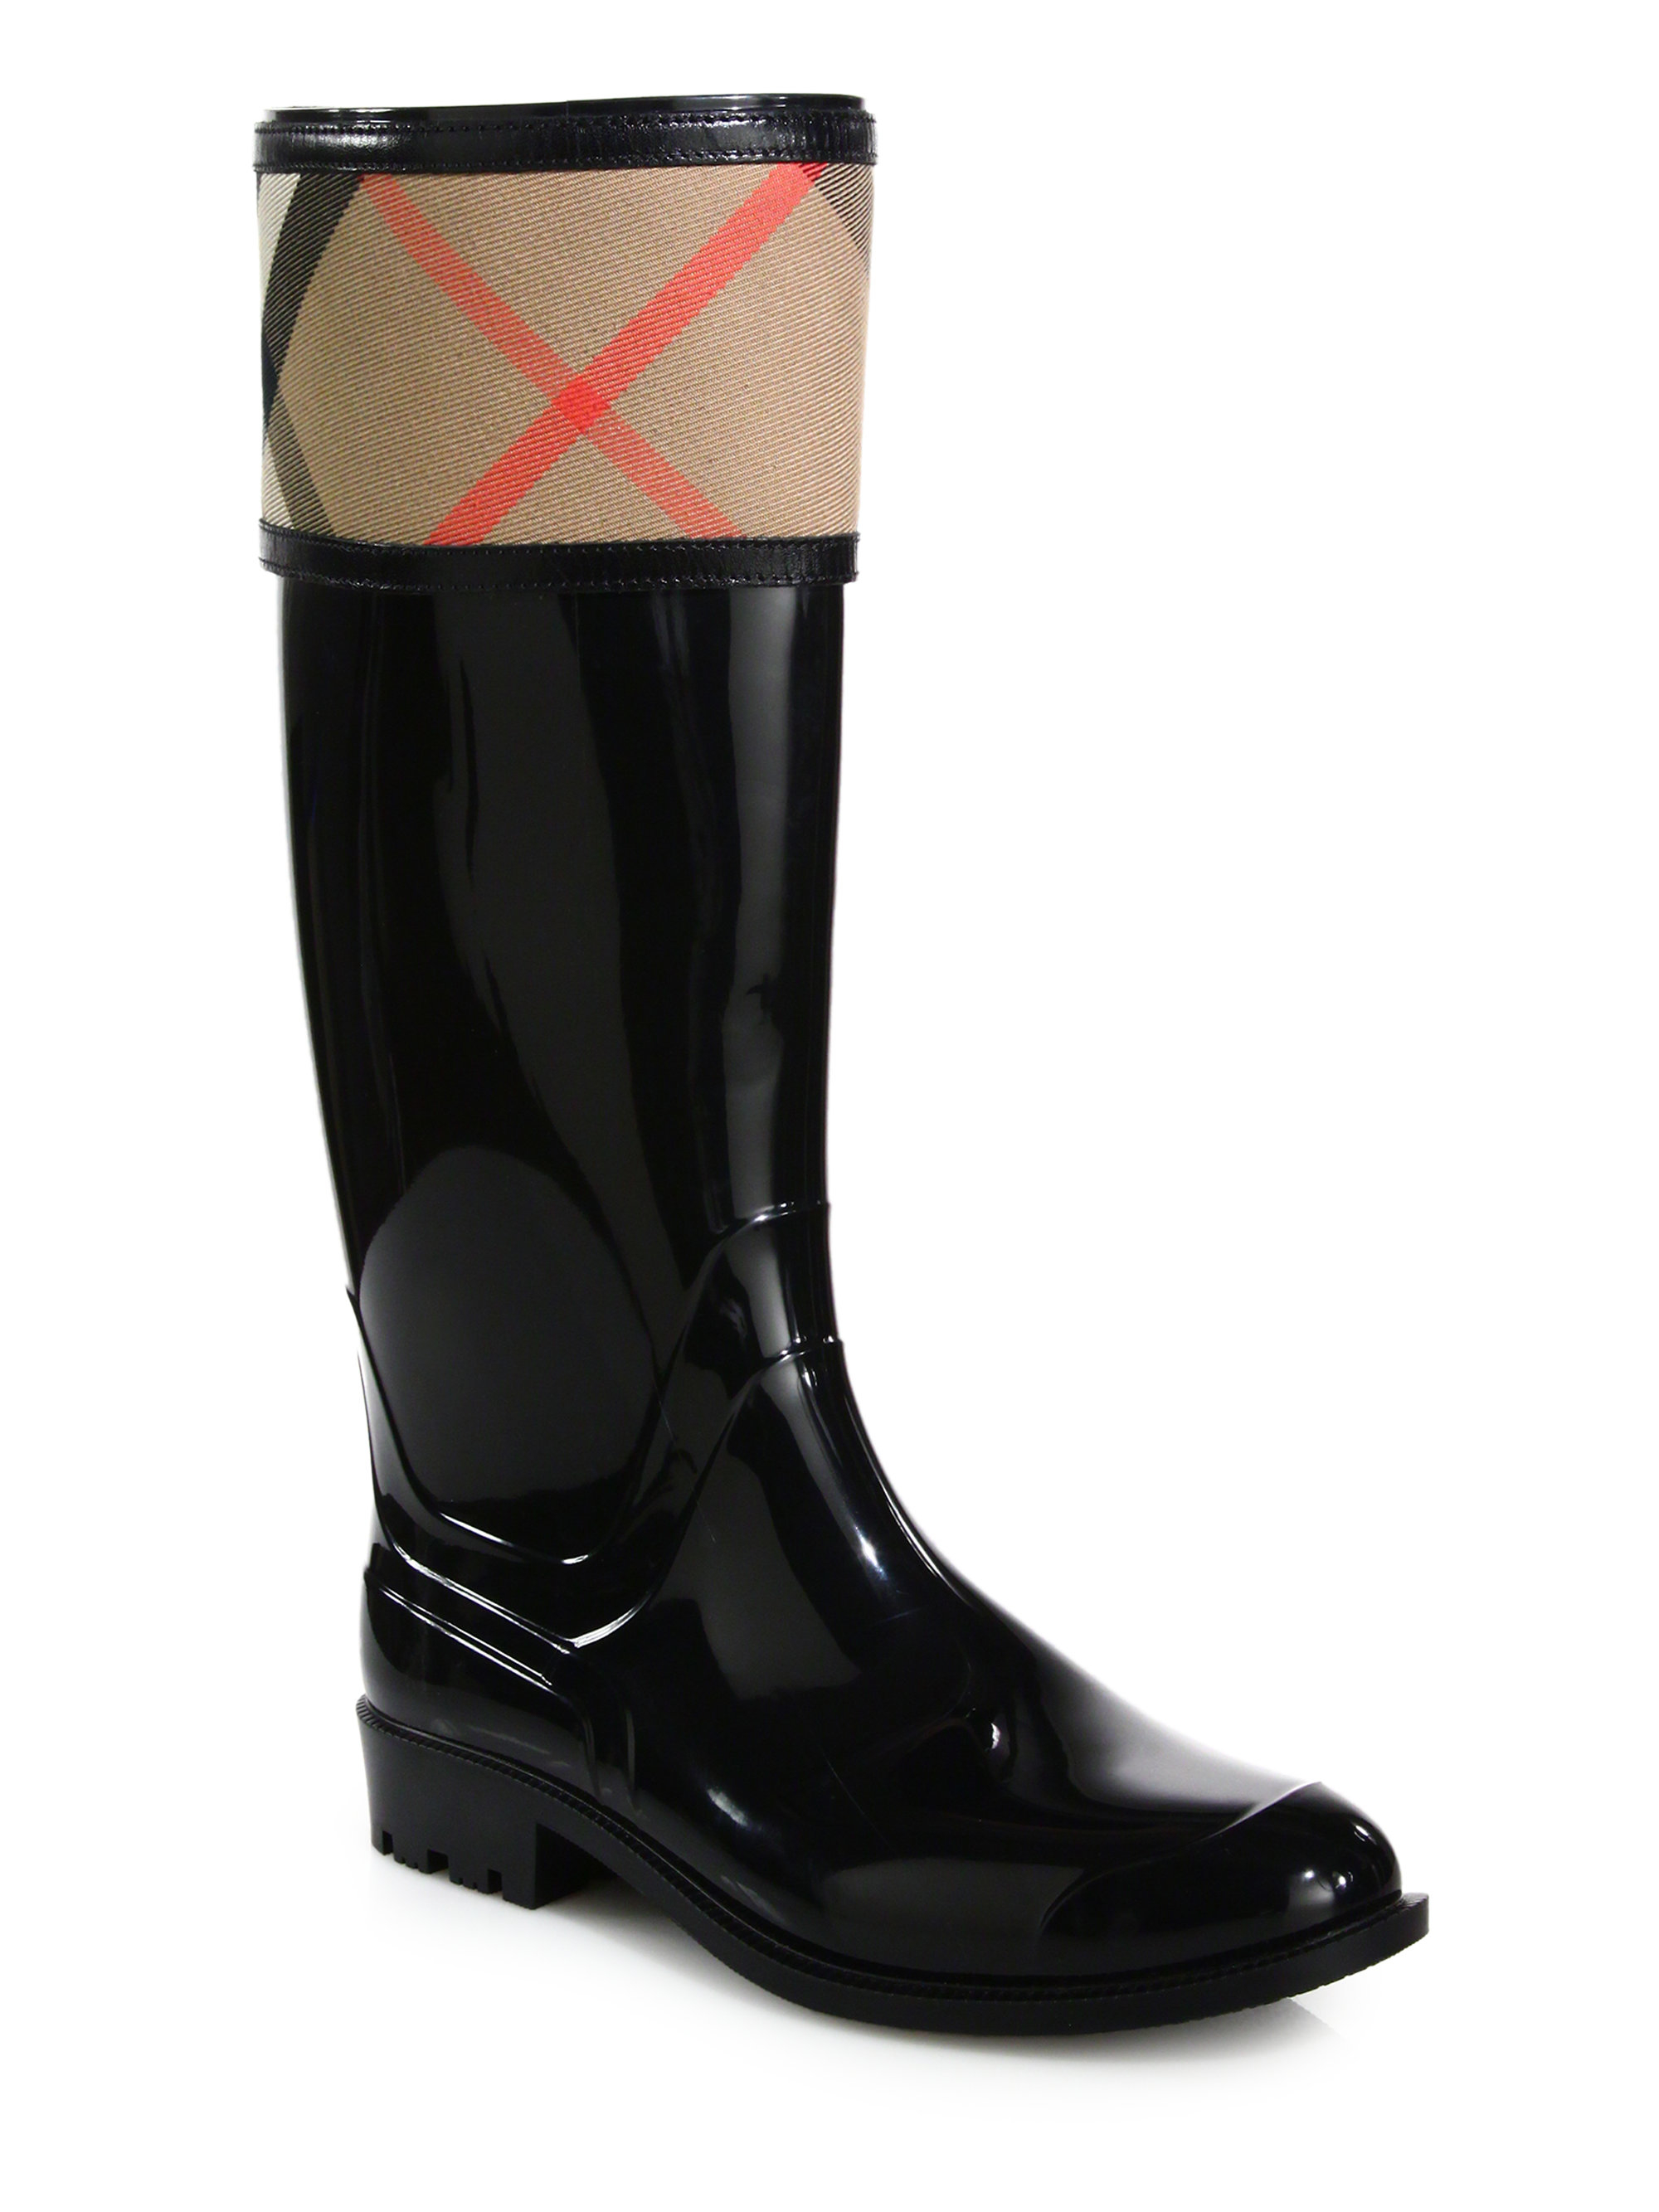 burberry crosshill check rain boots in black lyst